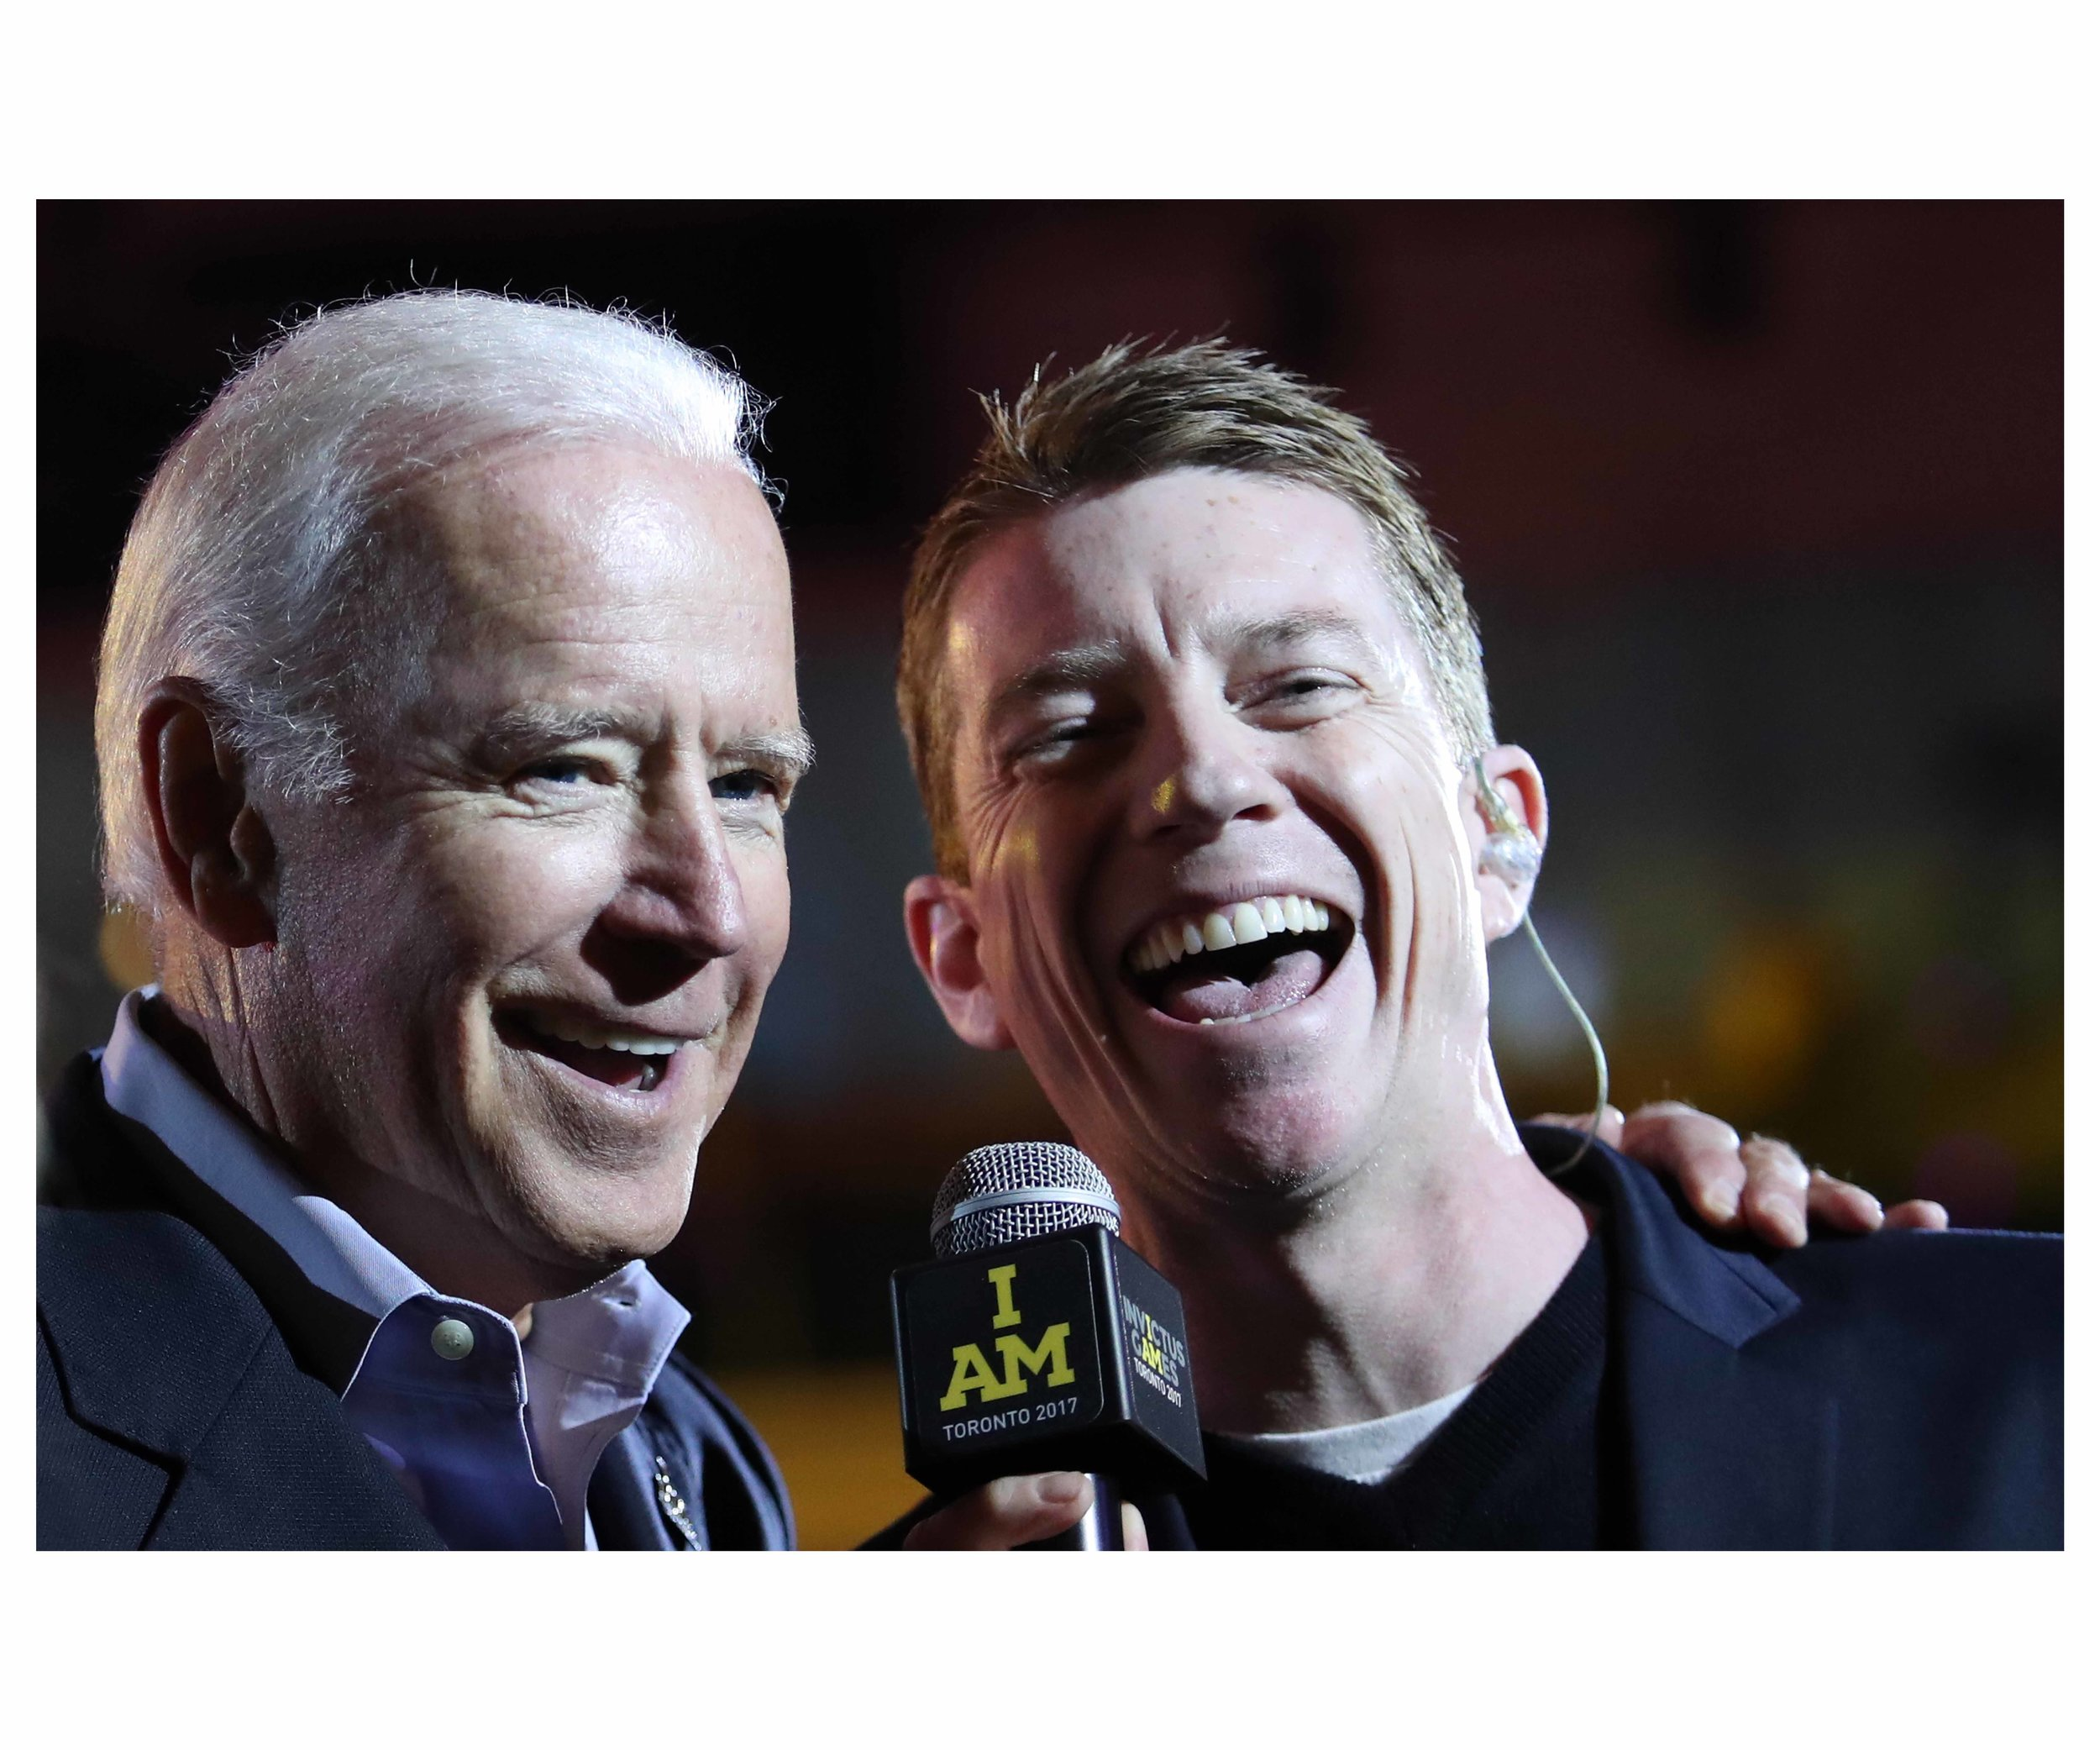 Daily Life & People - Joe Biden E.jpg